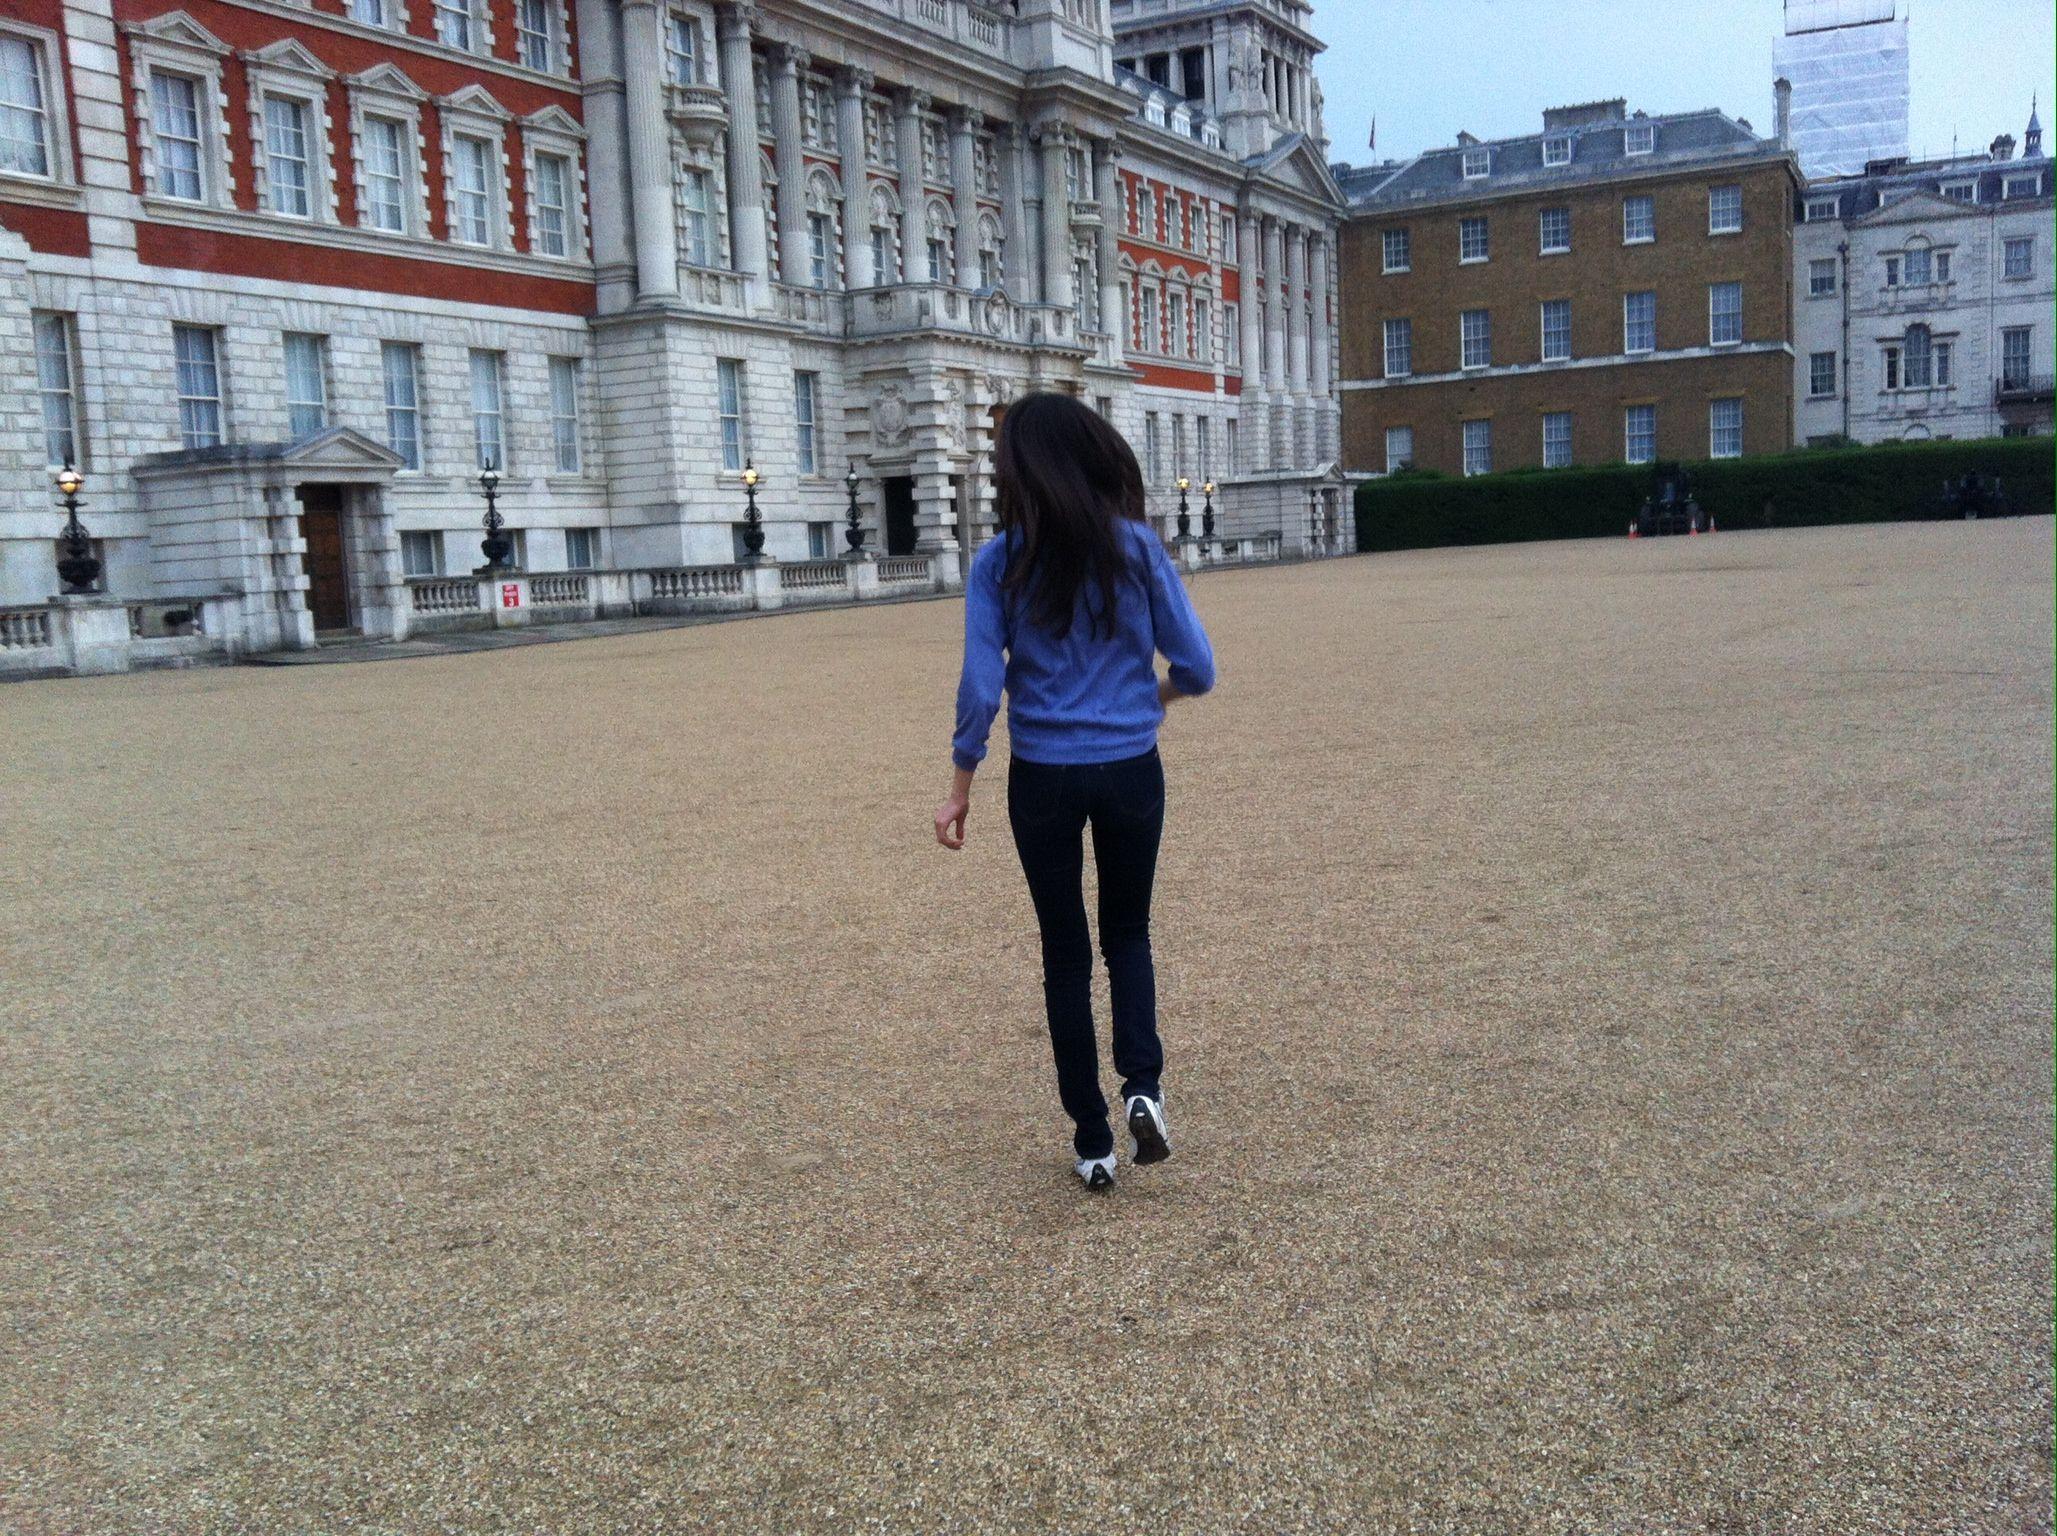 London- I'm a hopeless romantic